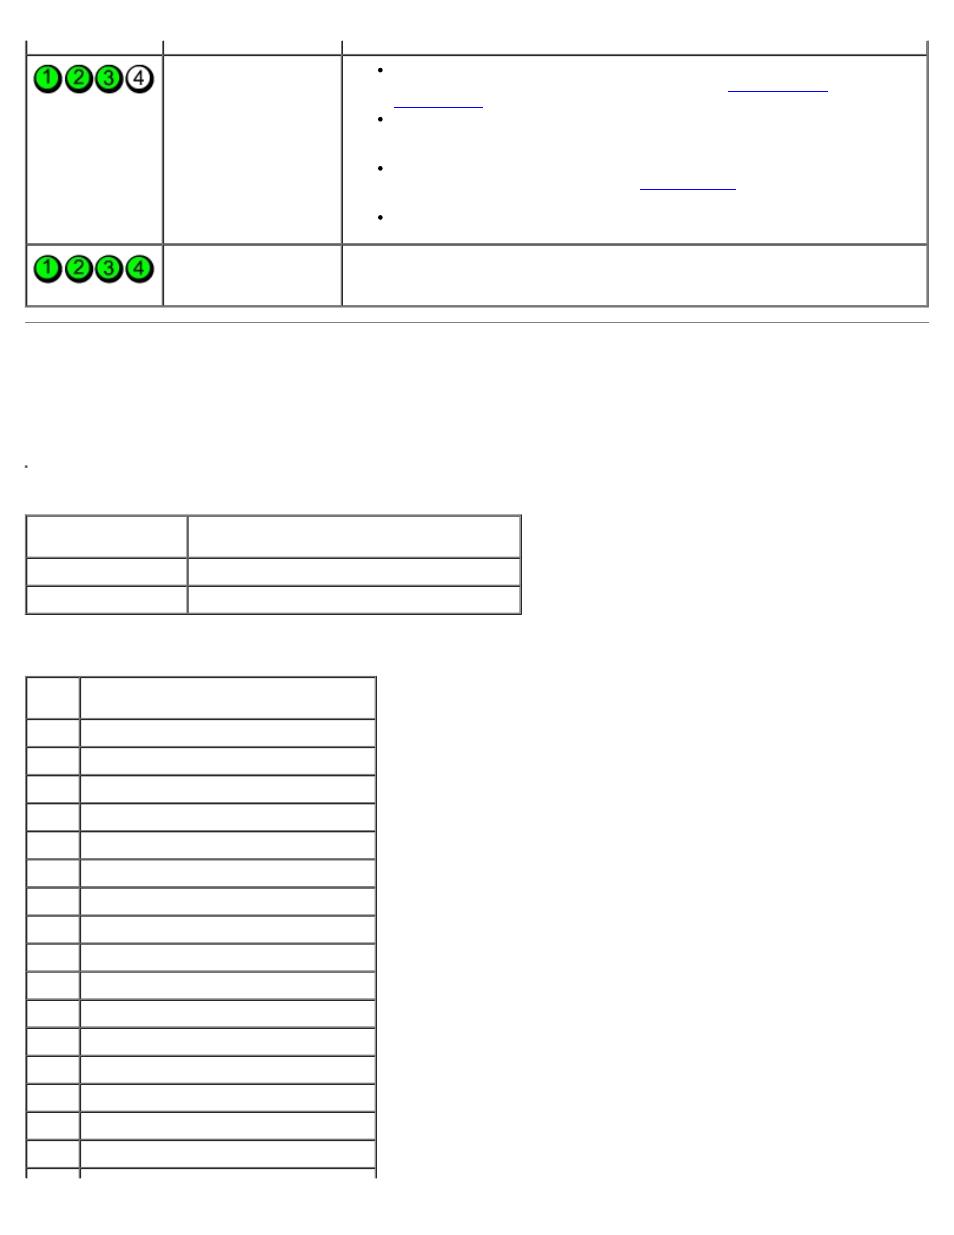 beep codes dell dimension 9150 xps 400 user manual page 22 69 rh manualsdir com